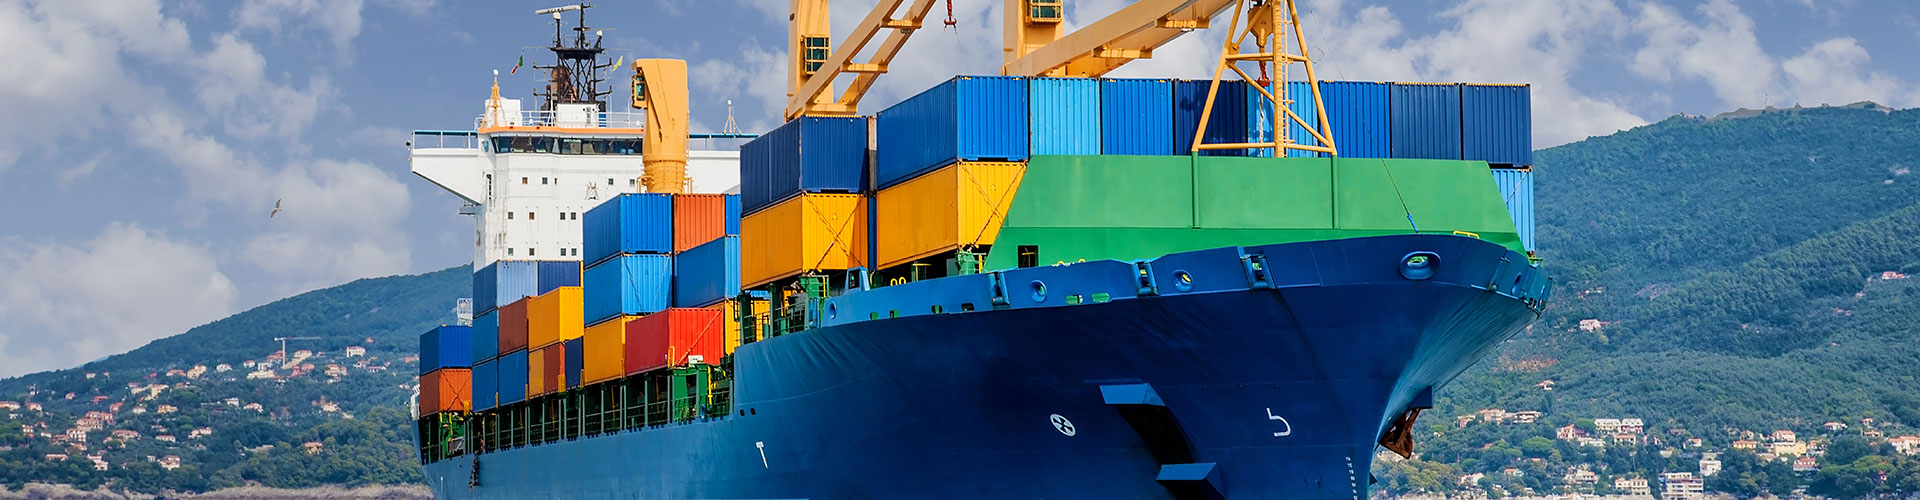 Zaner Maritime Industry